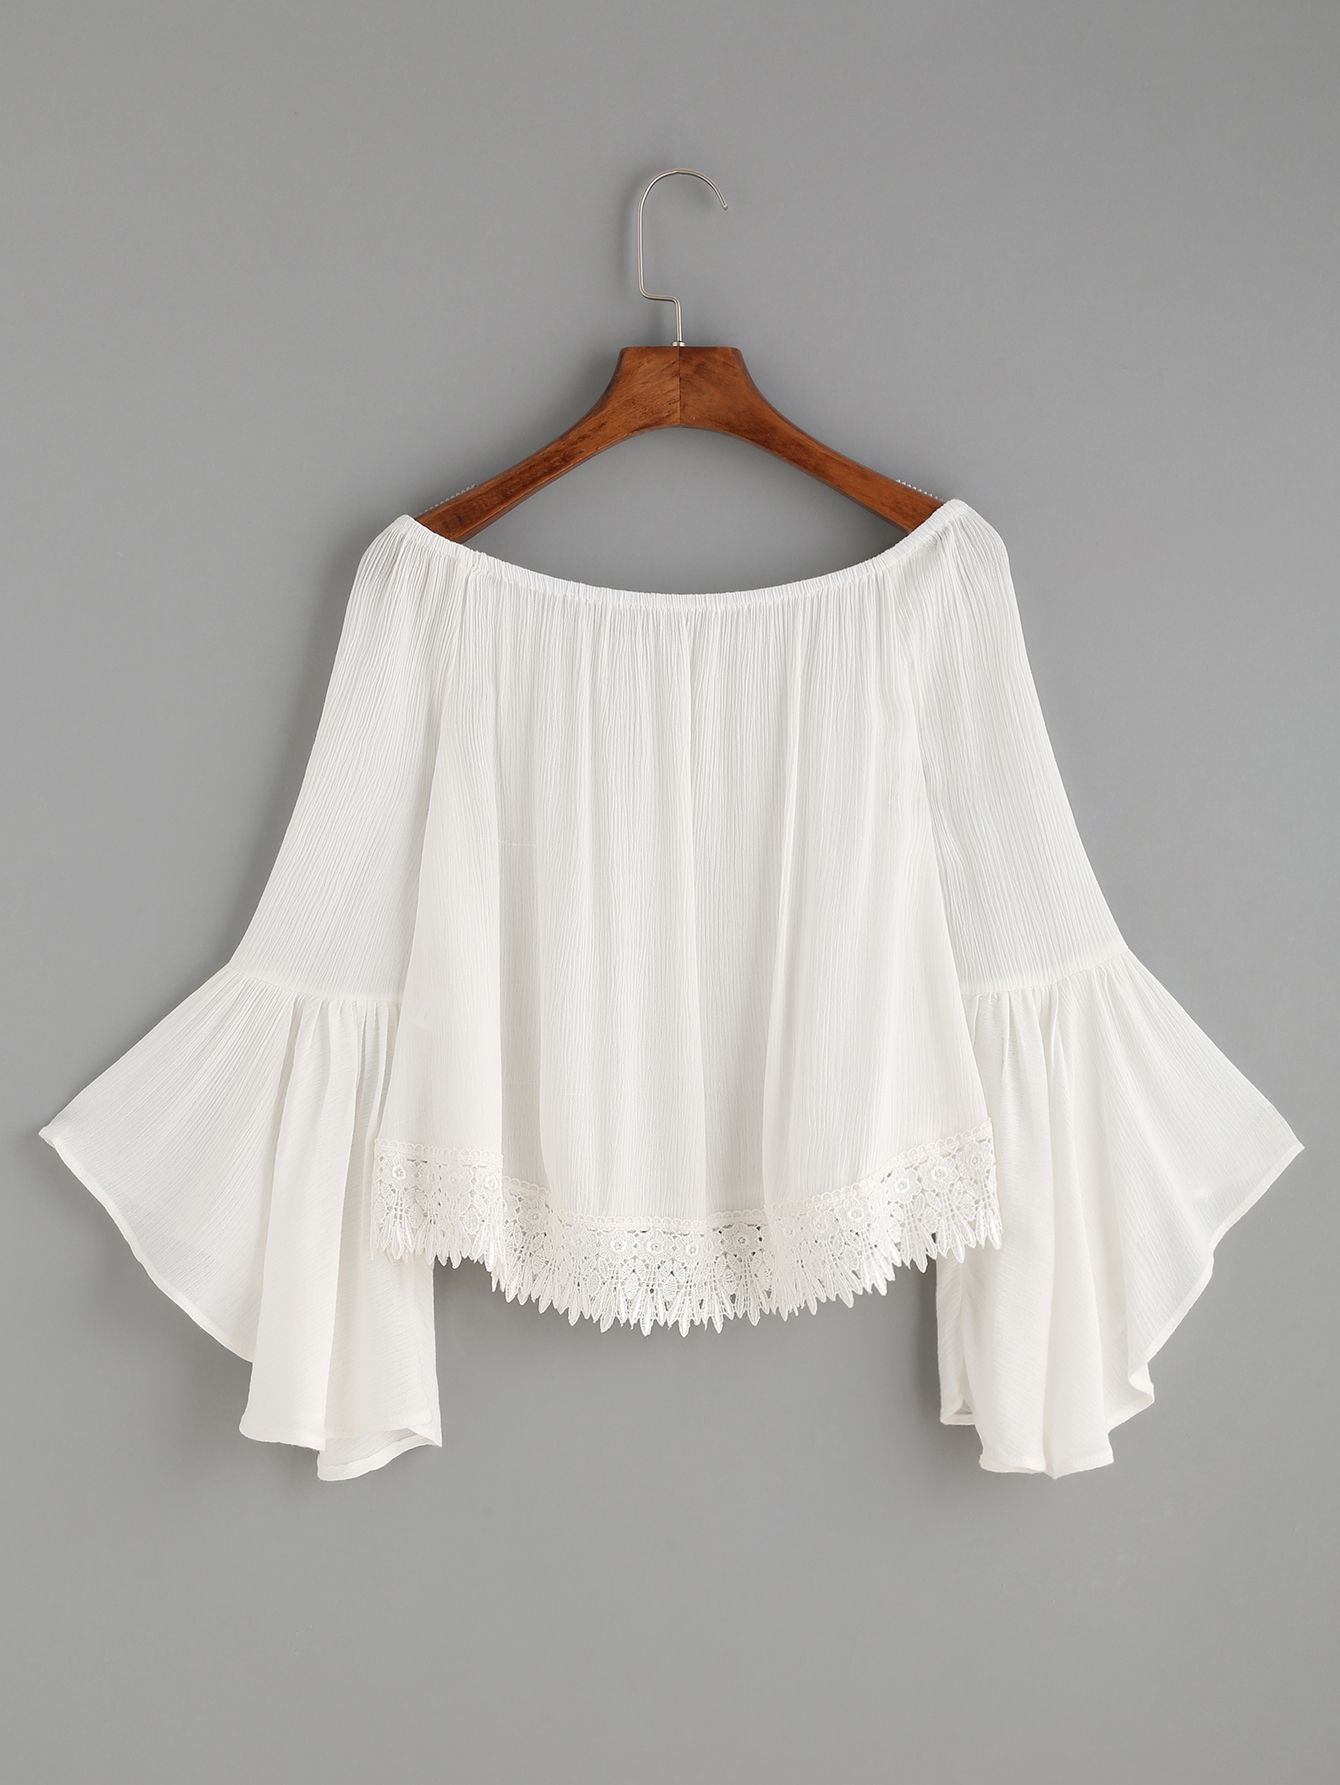 a038a2ade8ad48 RBLO160725005_2 Cold Shoulder Blouse, White Off Shoulder Top, Shoulder Tops,  Lace Trim,